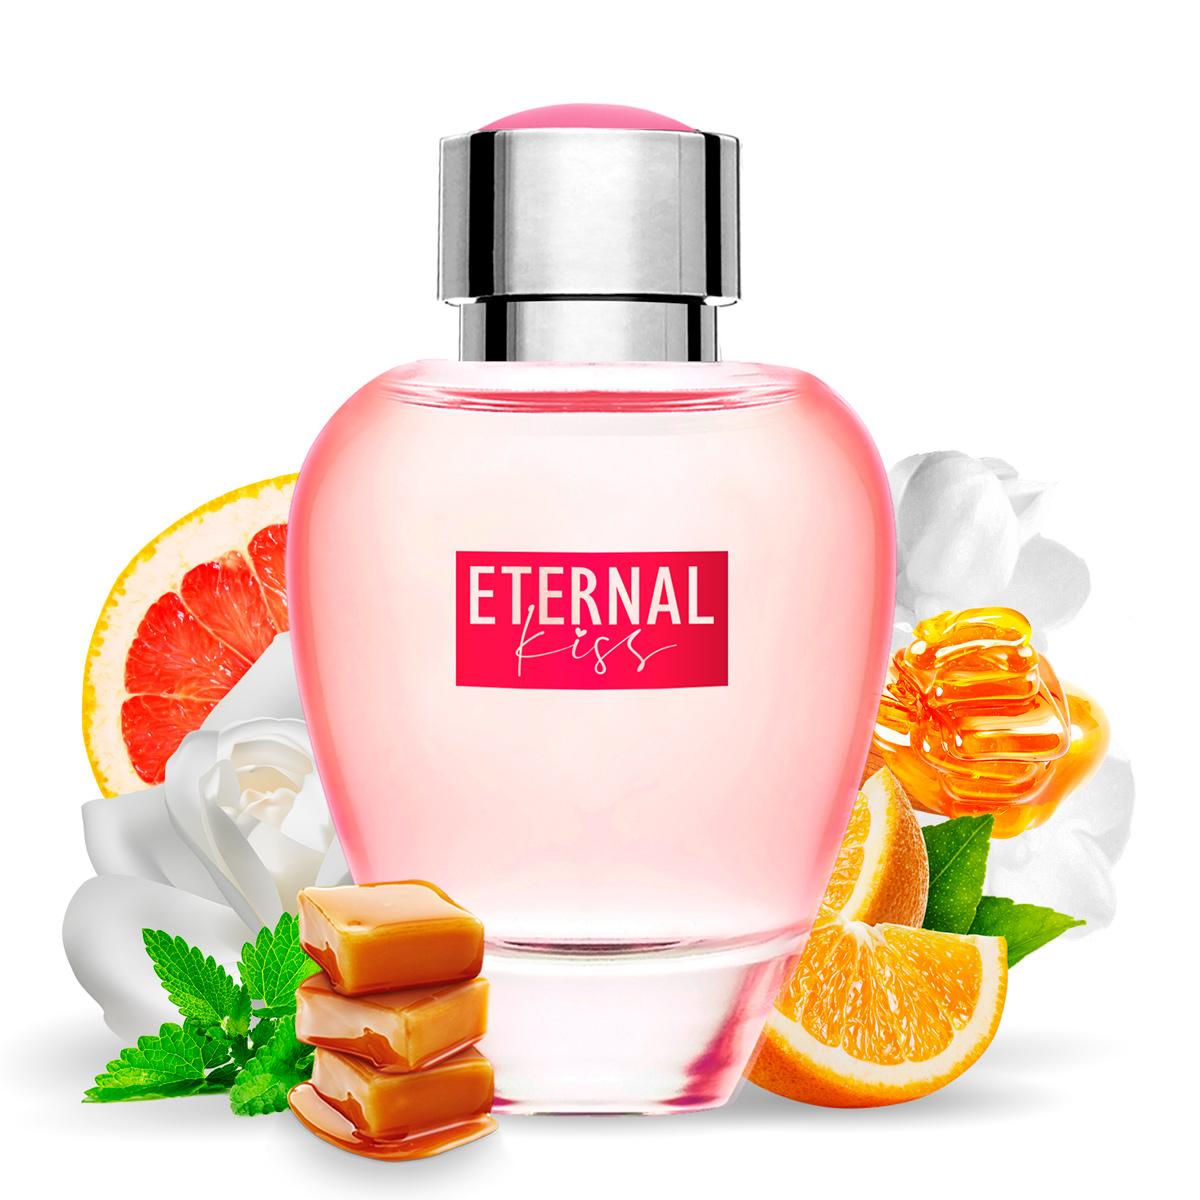 Kit 2 Perfumes Importados Miss Dream e Eternal Kiss La Rive